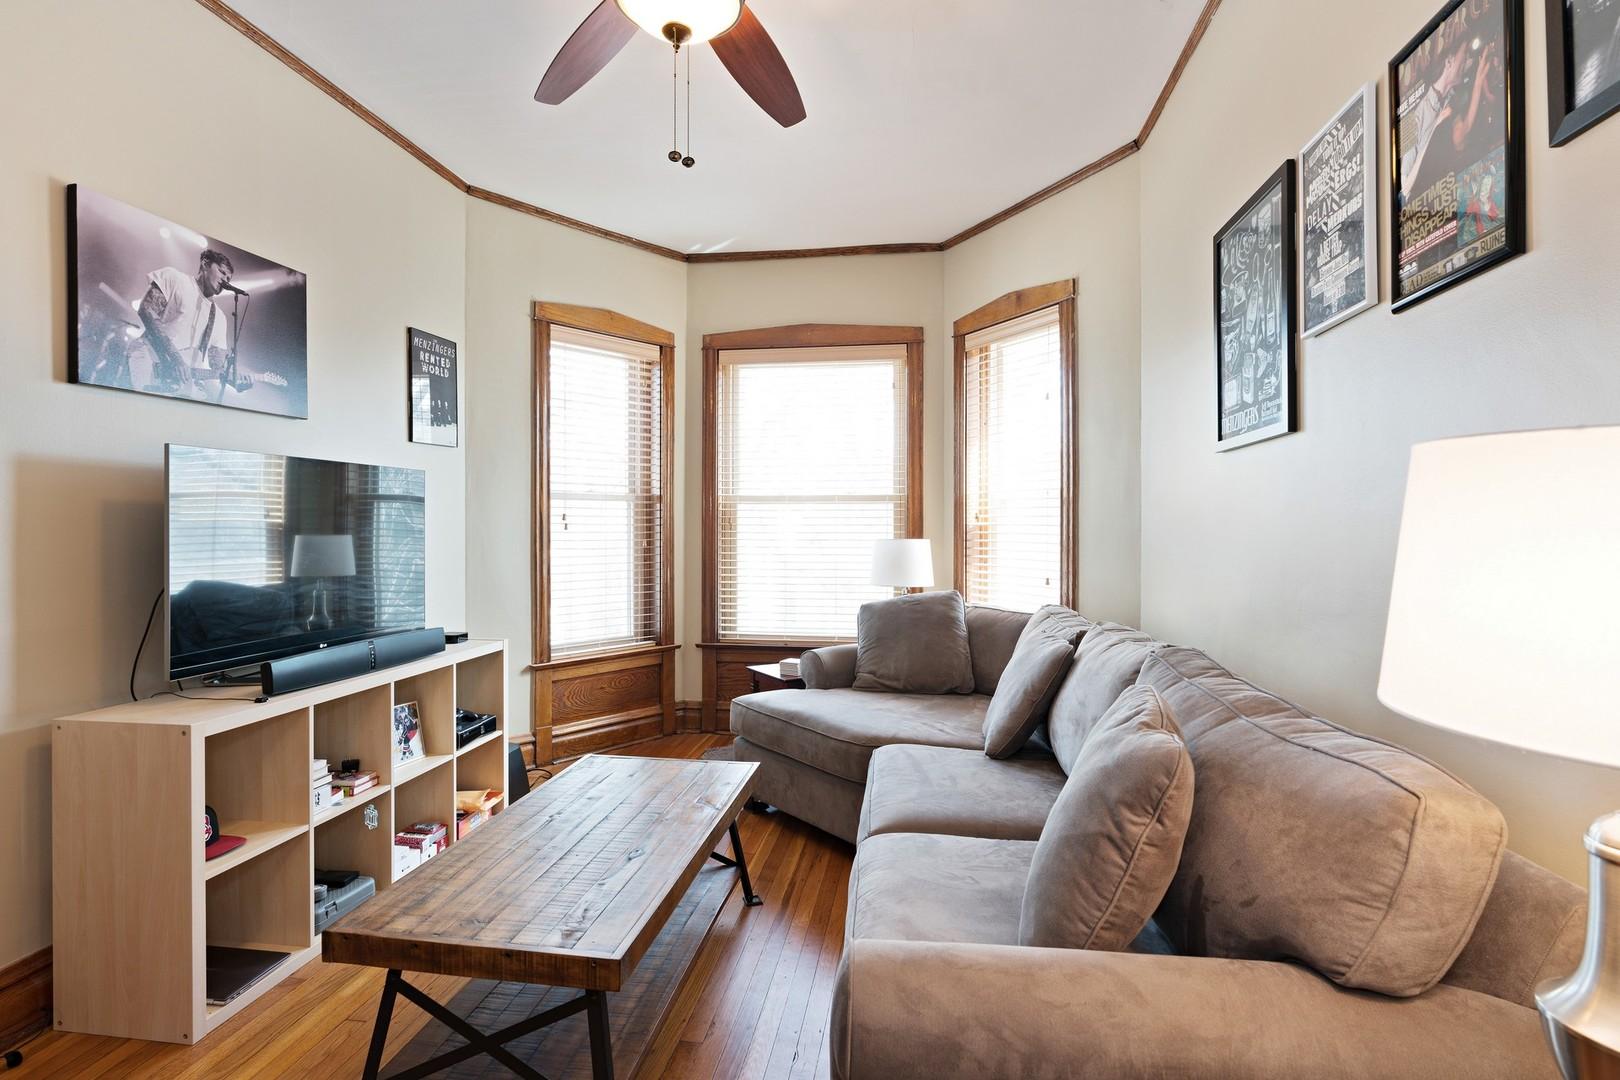 3746 Hermitage ,Chicago, Illinois 60613